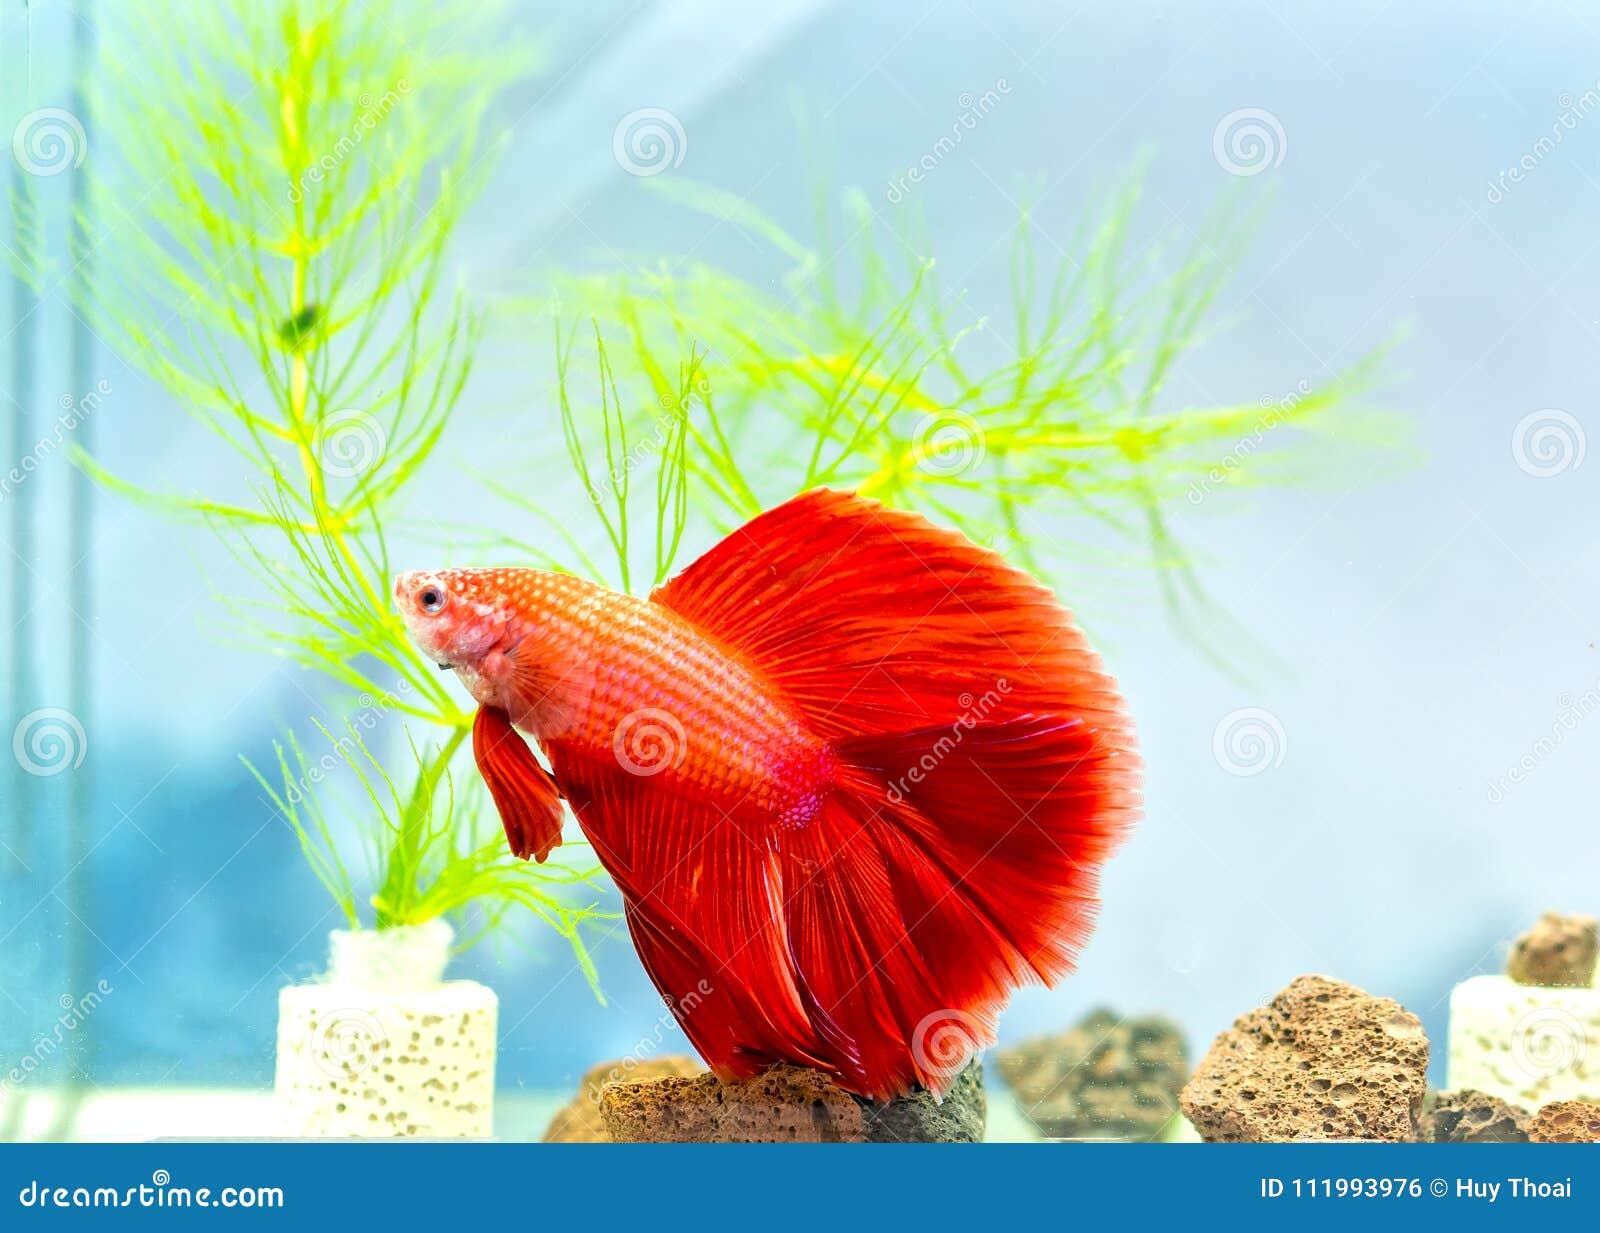 Halfmoon Betta Colorful Swimming In Fish Tank. Stock Photo - Image ...